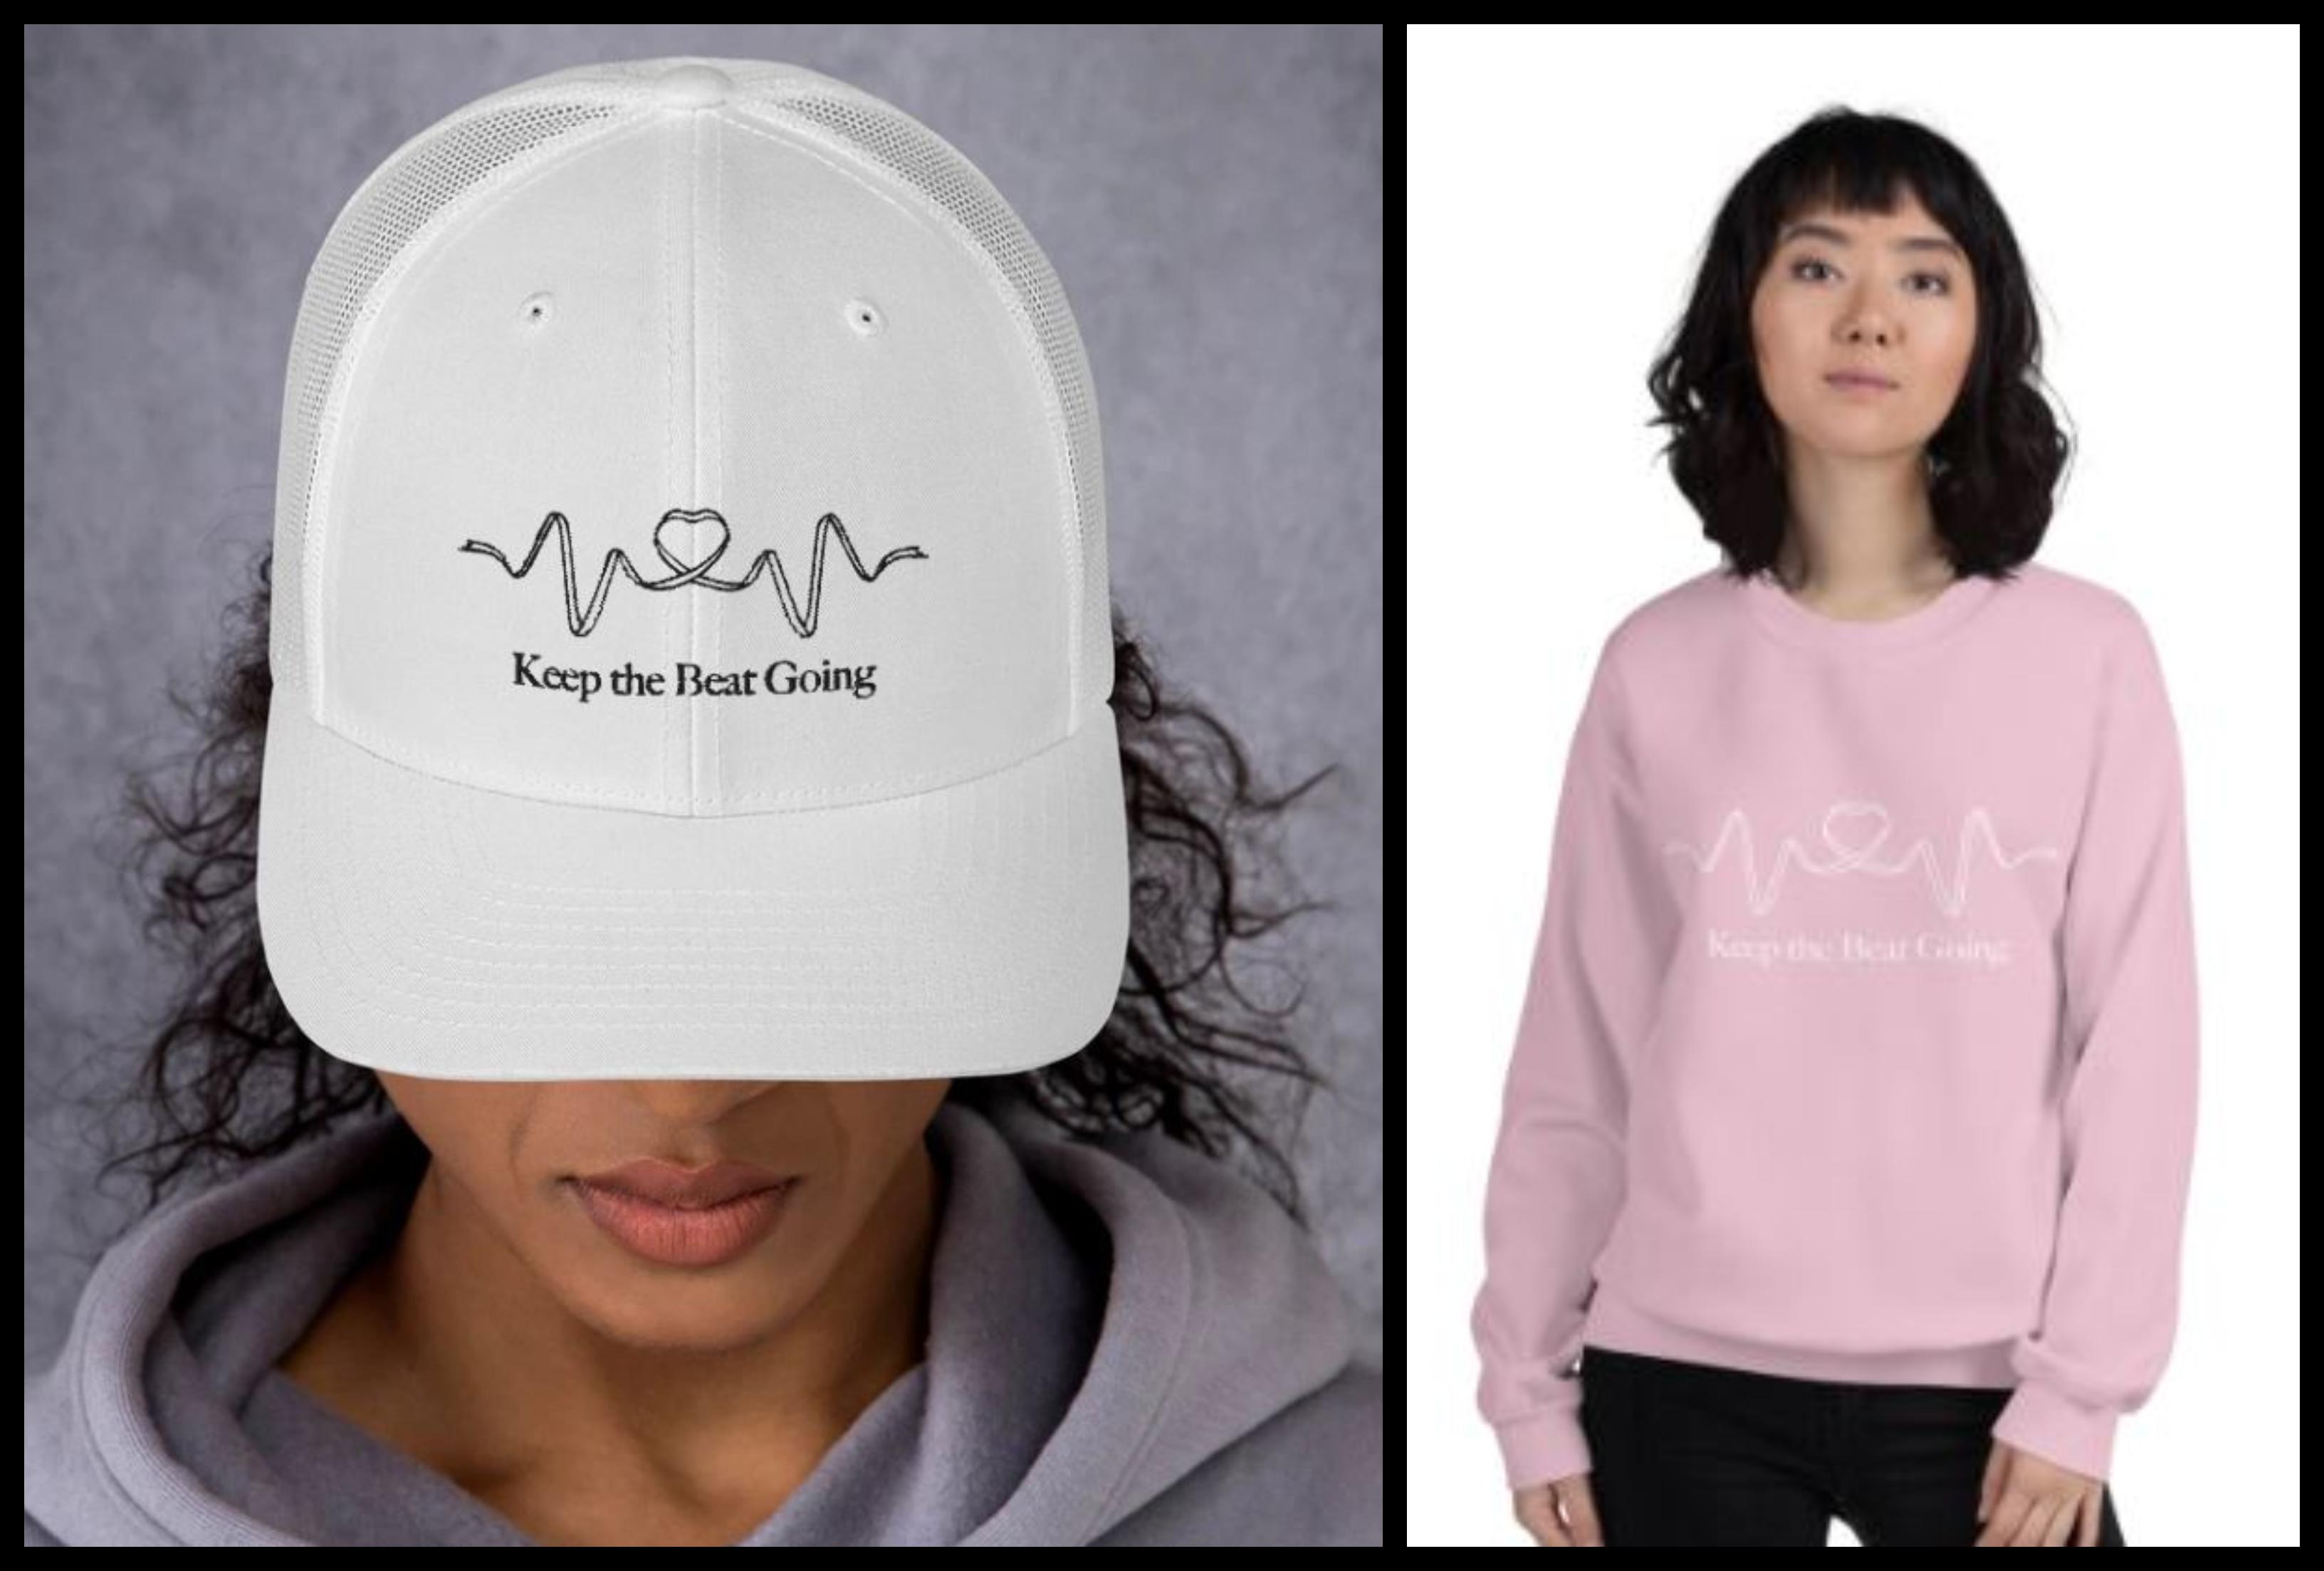 Keep the Beat Going merchandise